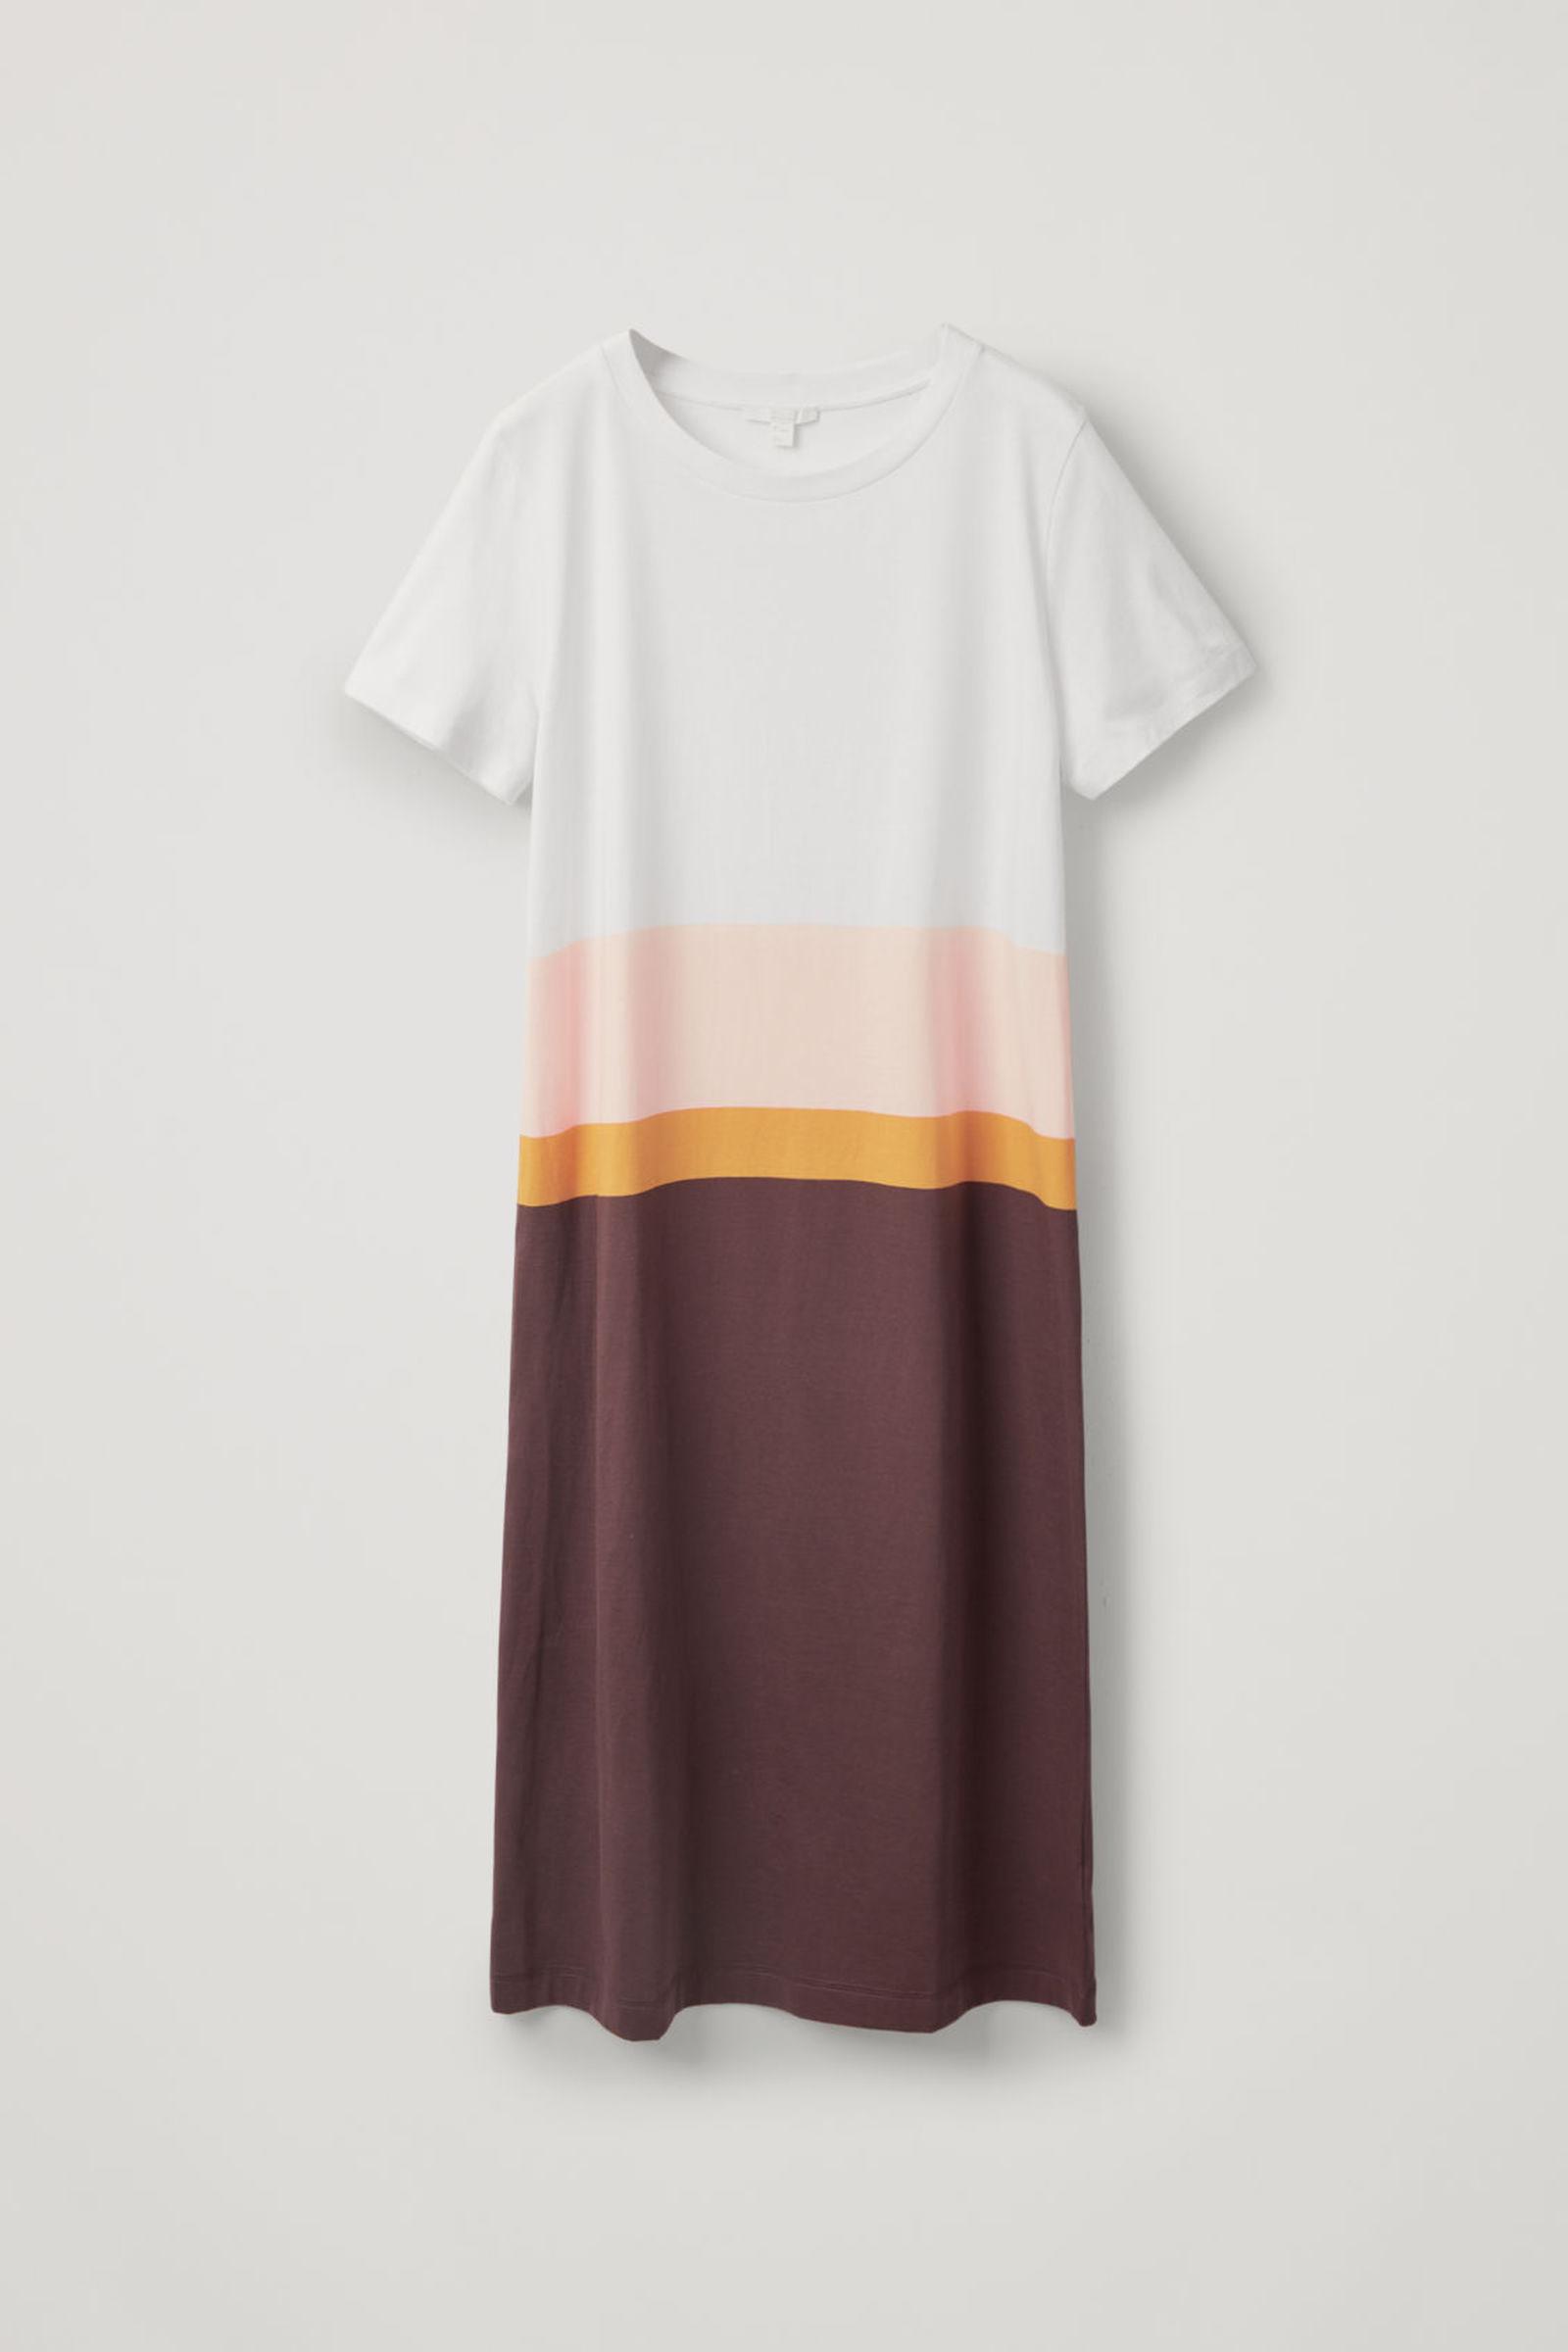 COS 코튼 티셔츠 드레스의 멀티컬러컬러 Product입니다.